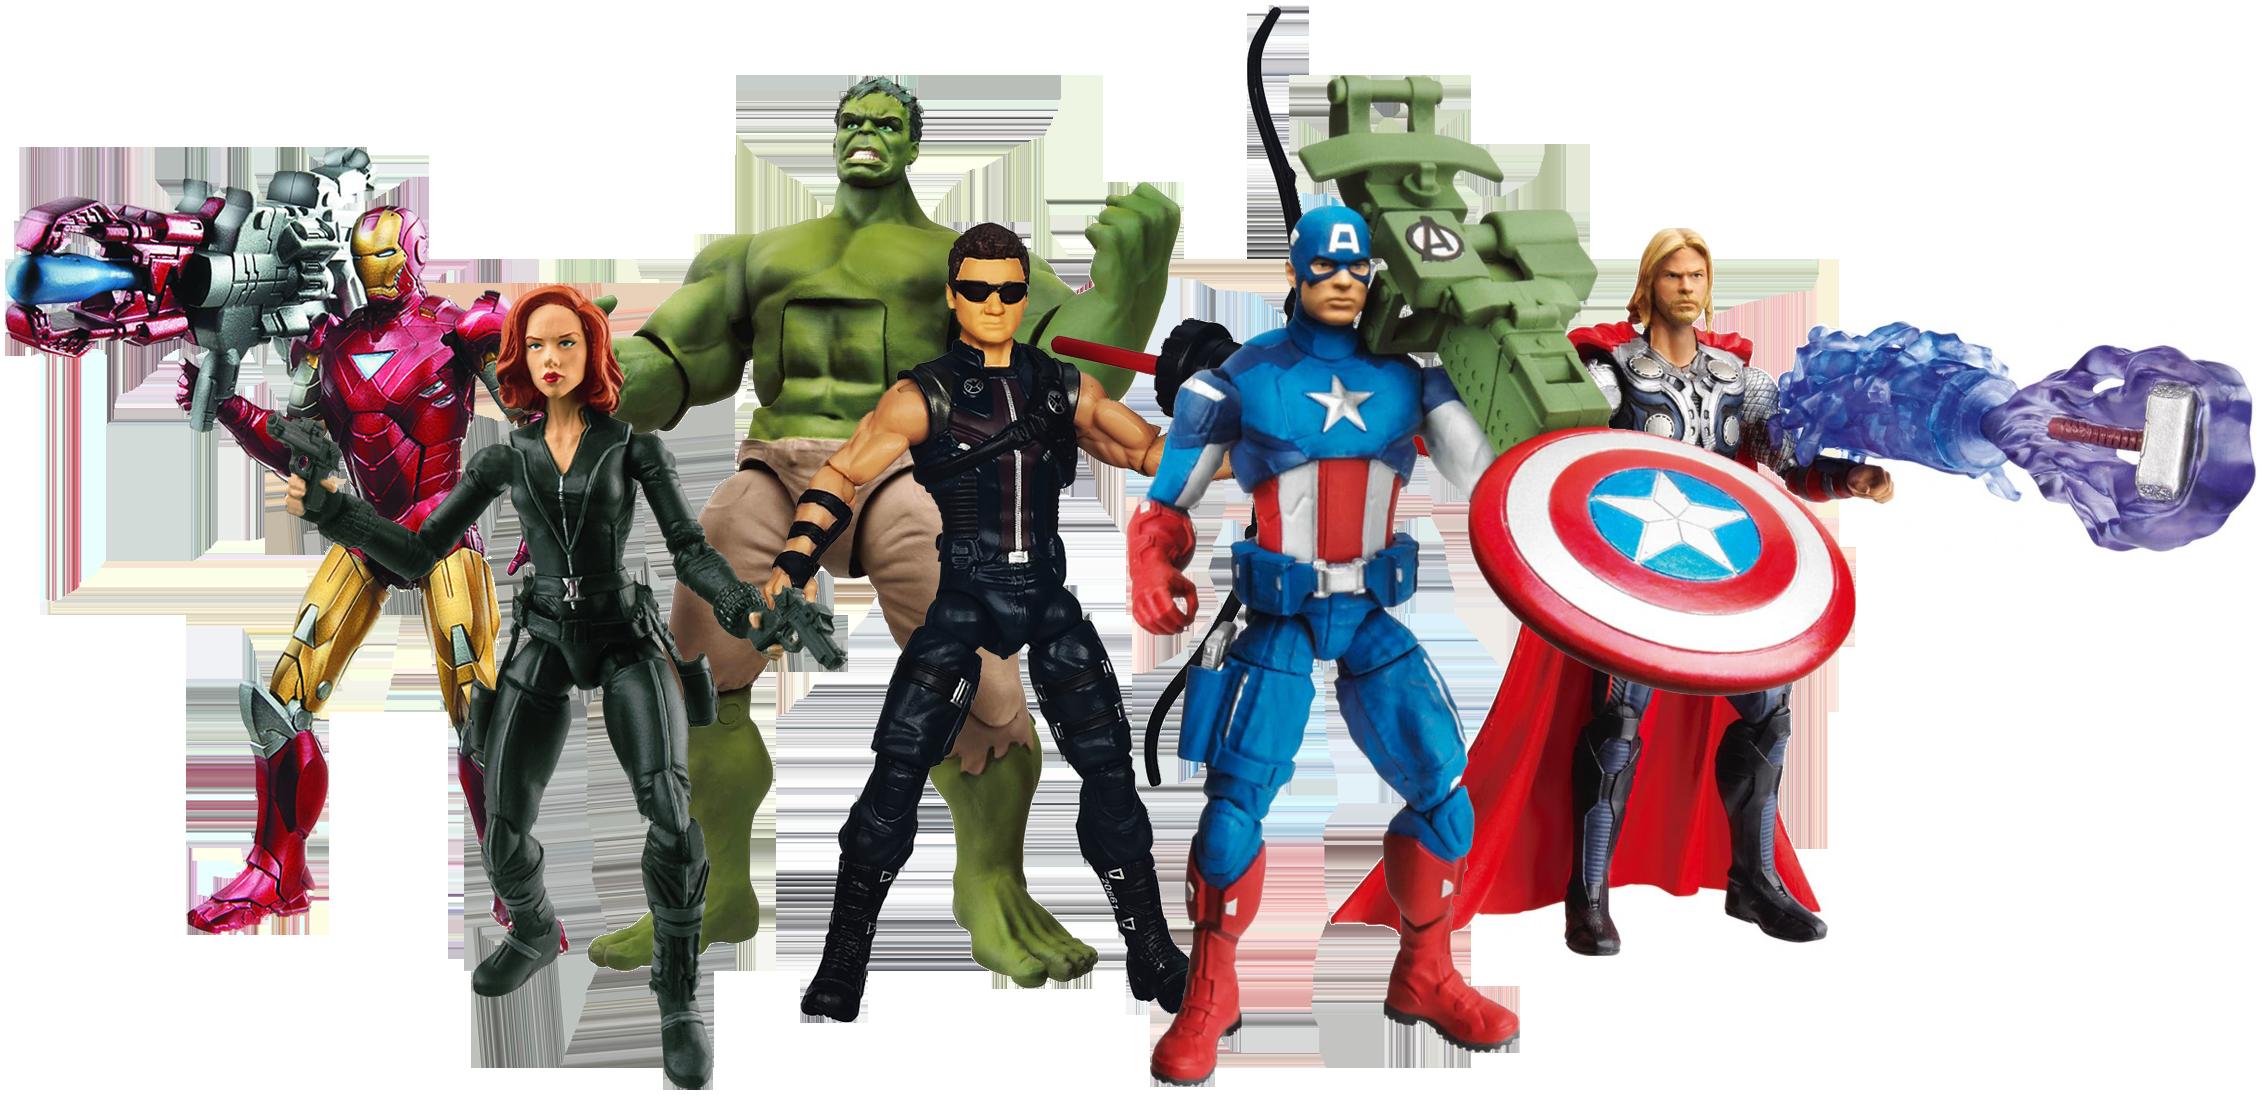 Superheroes action figure